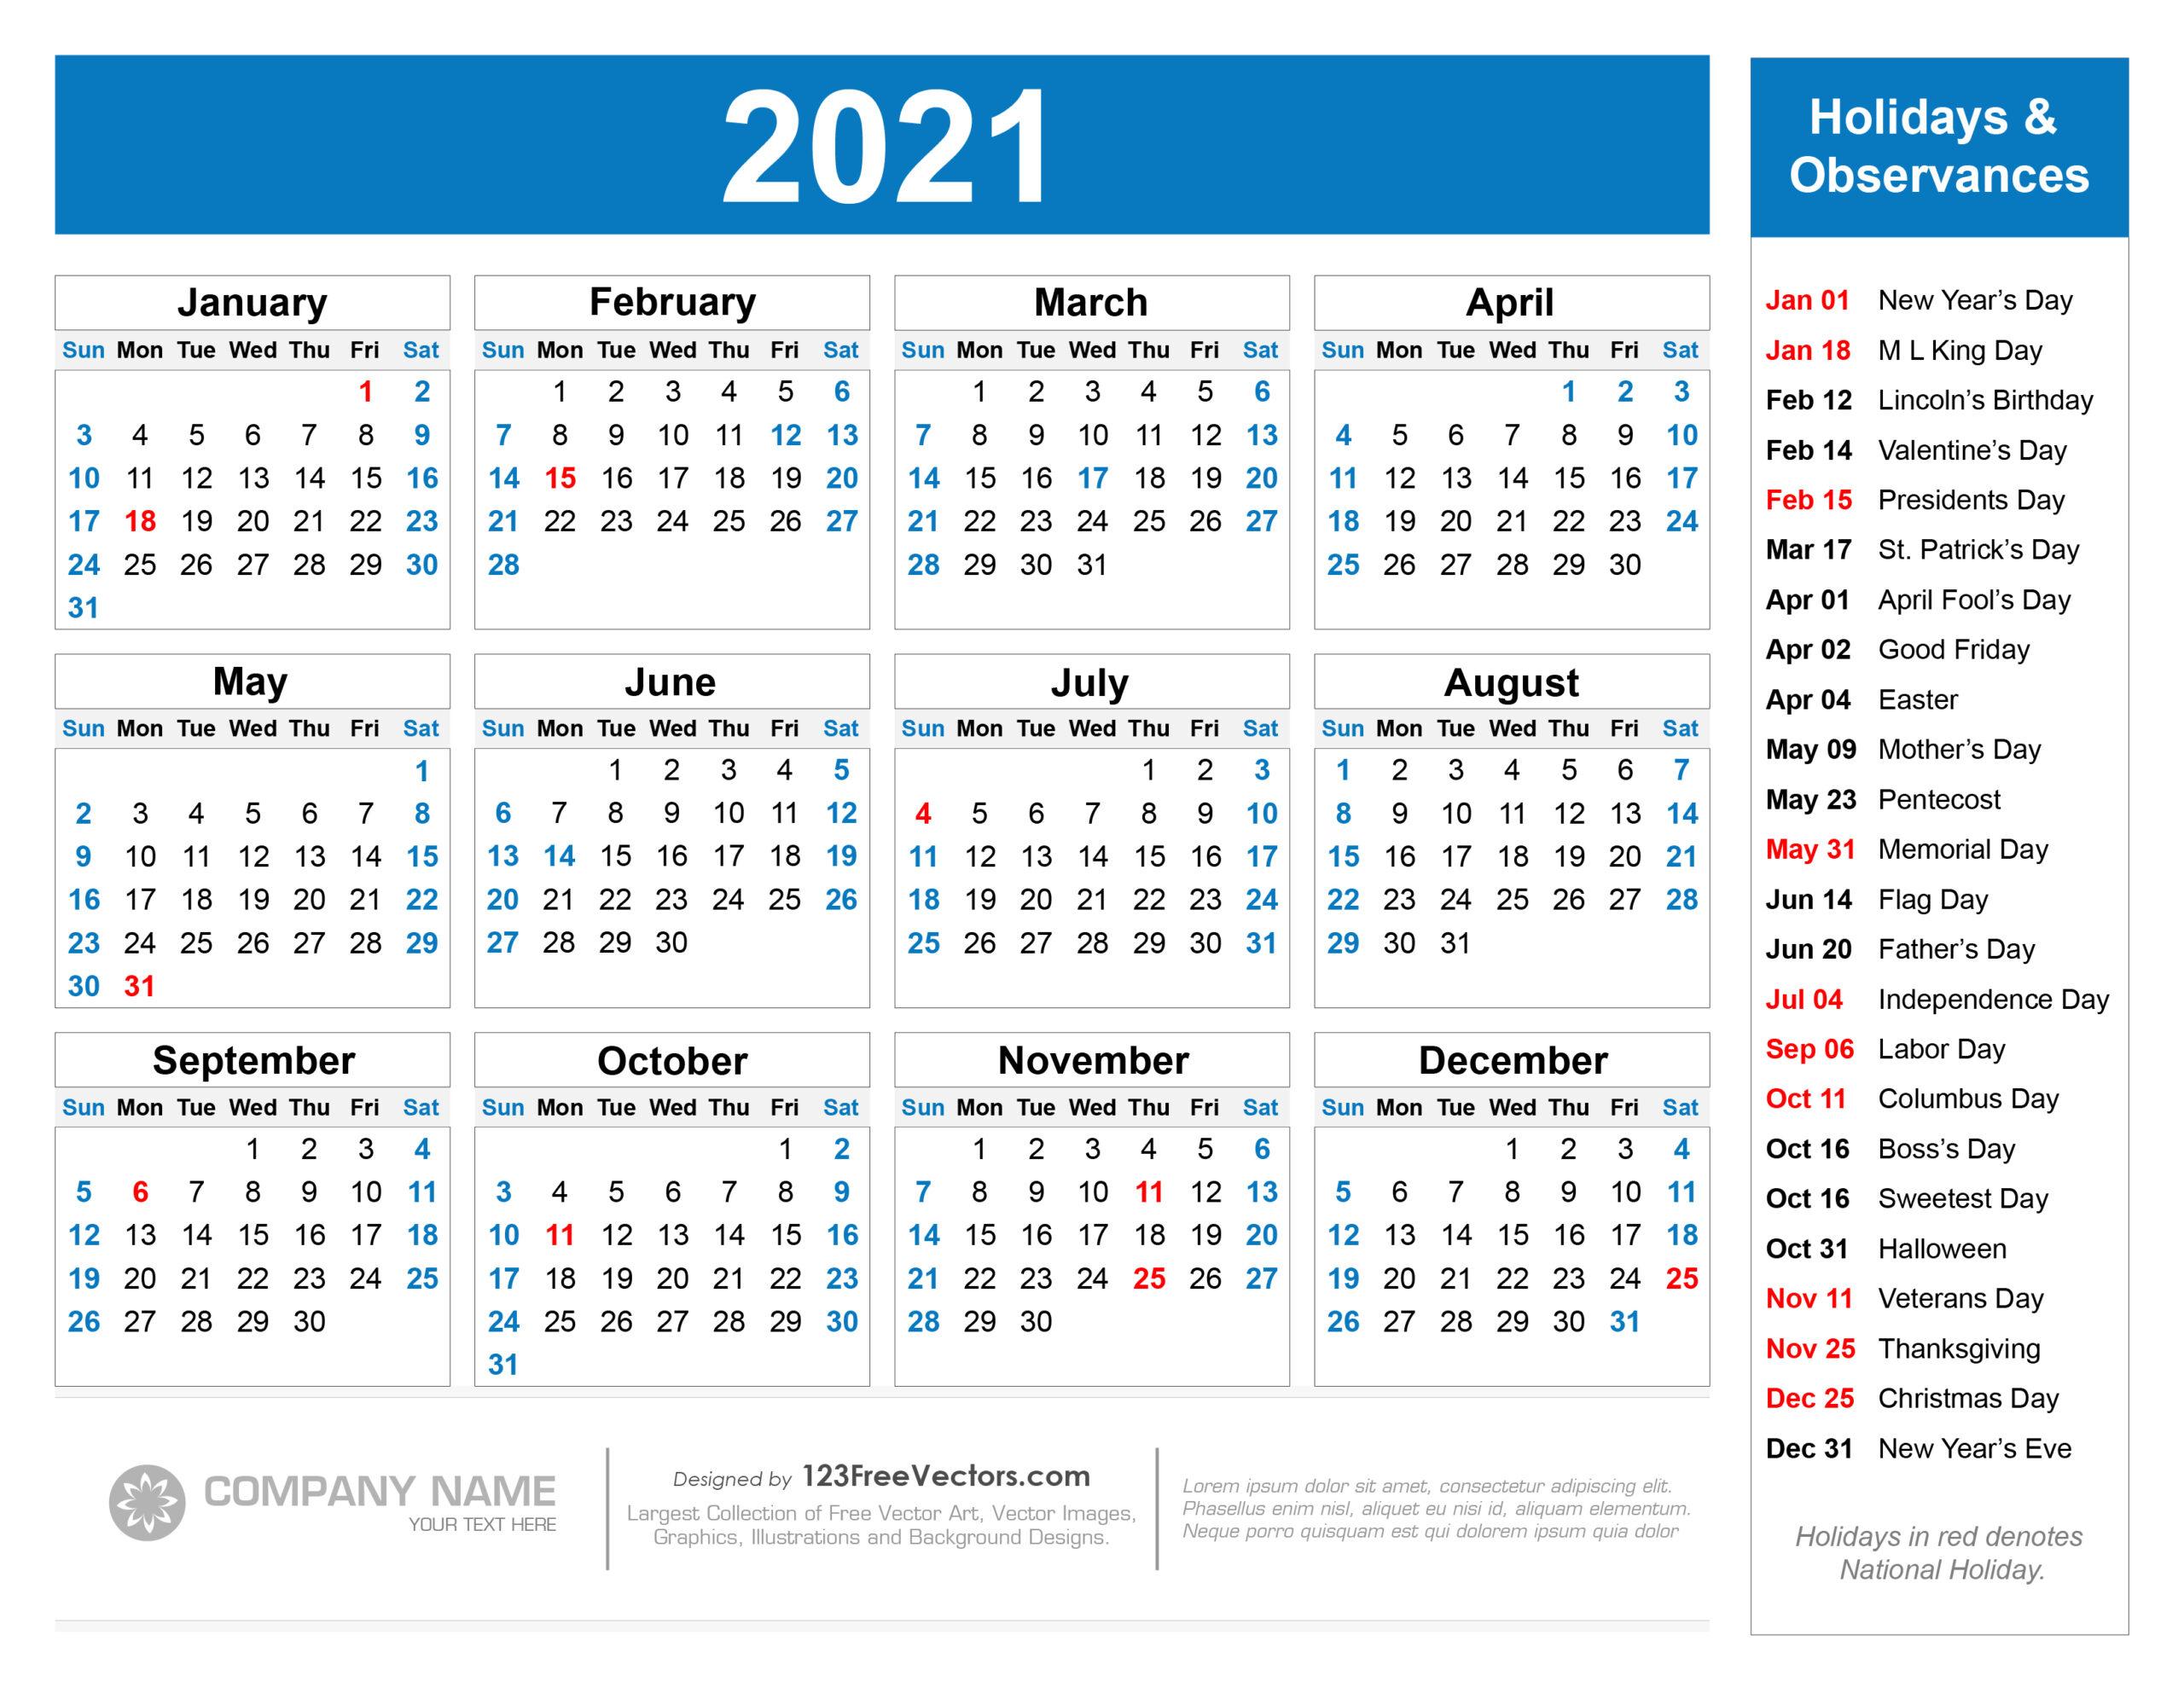 2021 Calendar Holidays And Observances   Printable Calendars 2021 with 2021 Calendar Free Printable